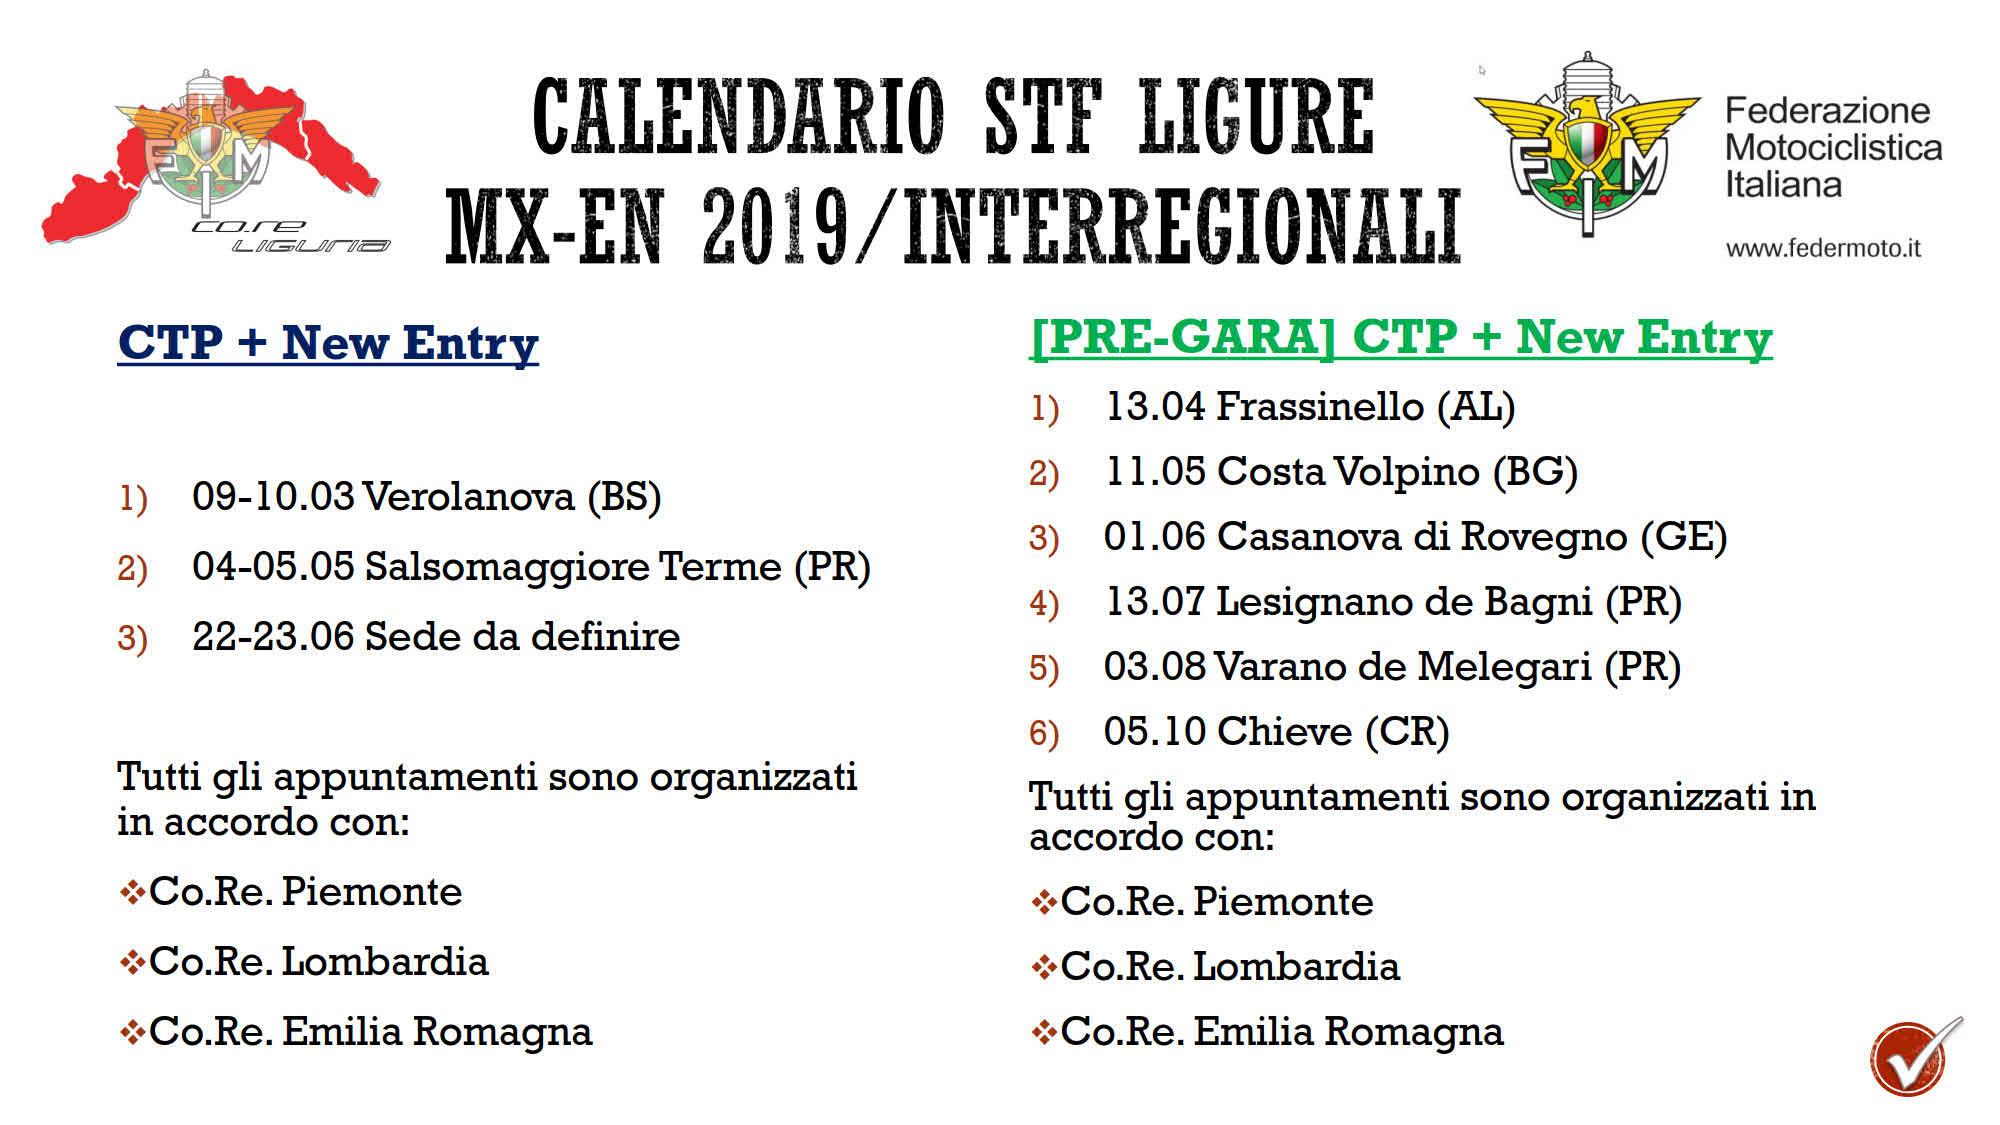 Calendario Attuale.Calendario Settore Tecnico Regionale Ligure Mx En 2019 Fmi